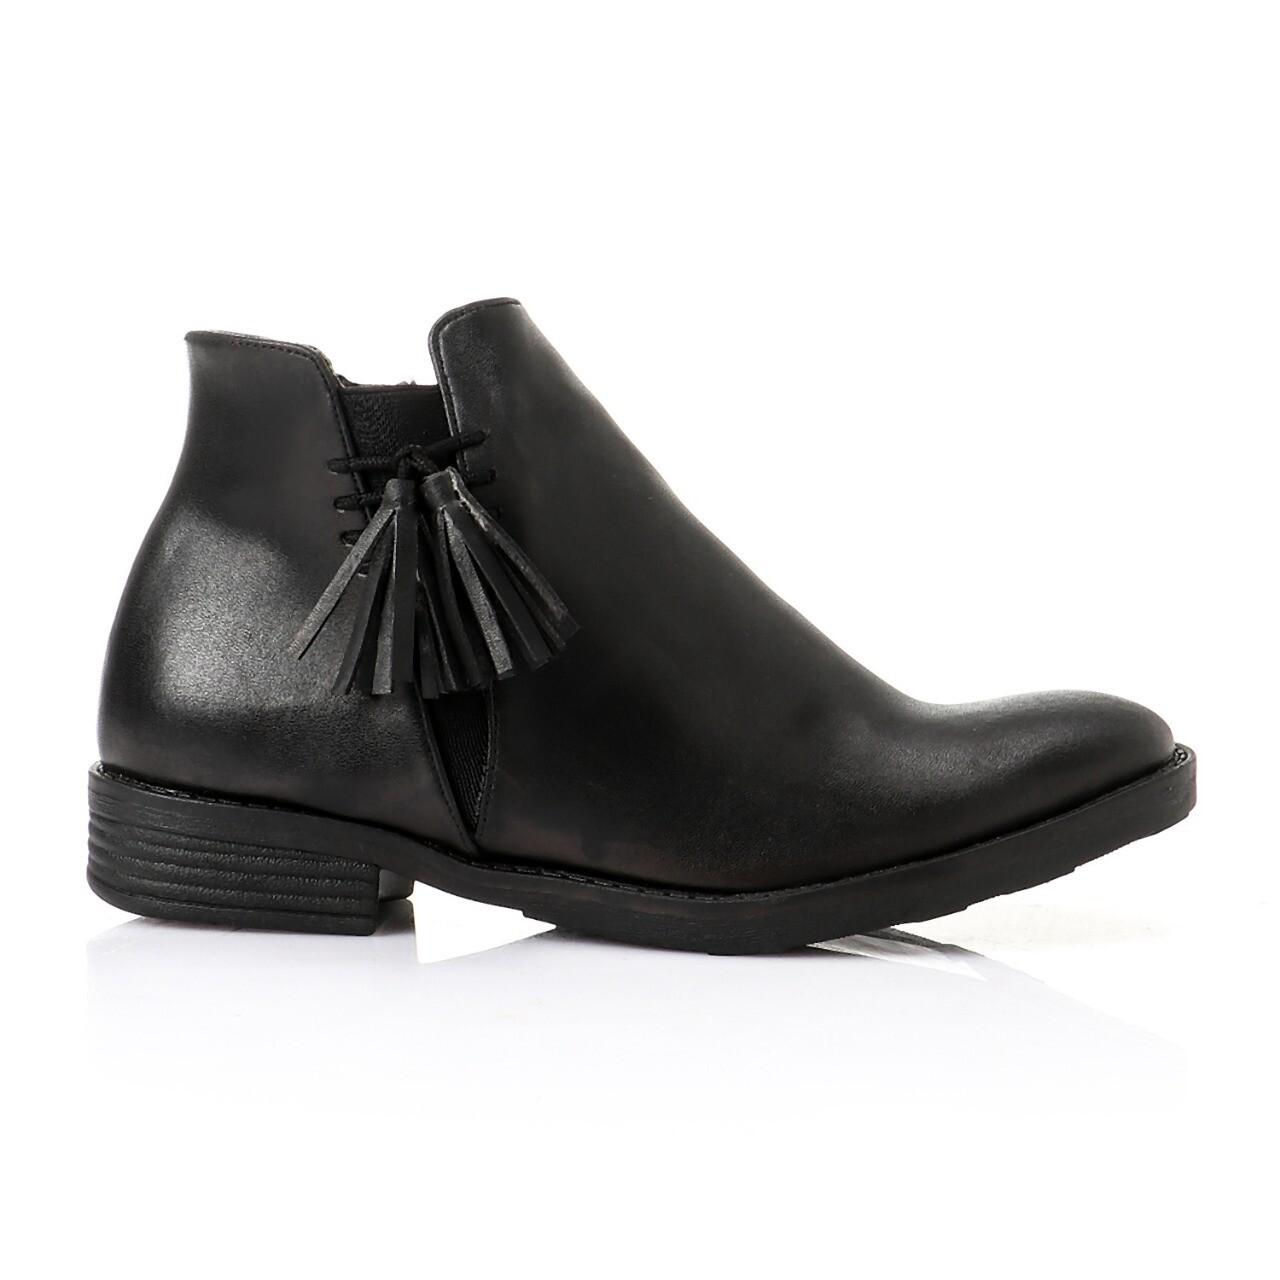 3750-half boot-black